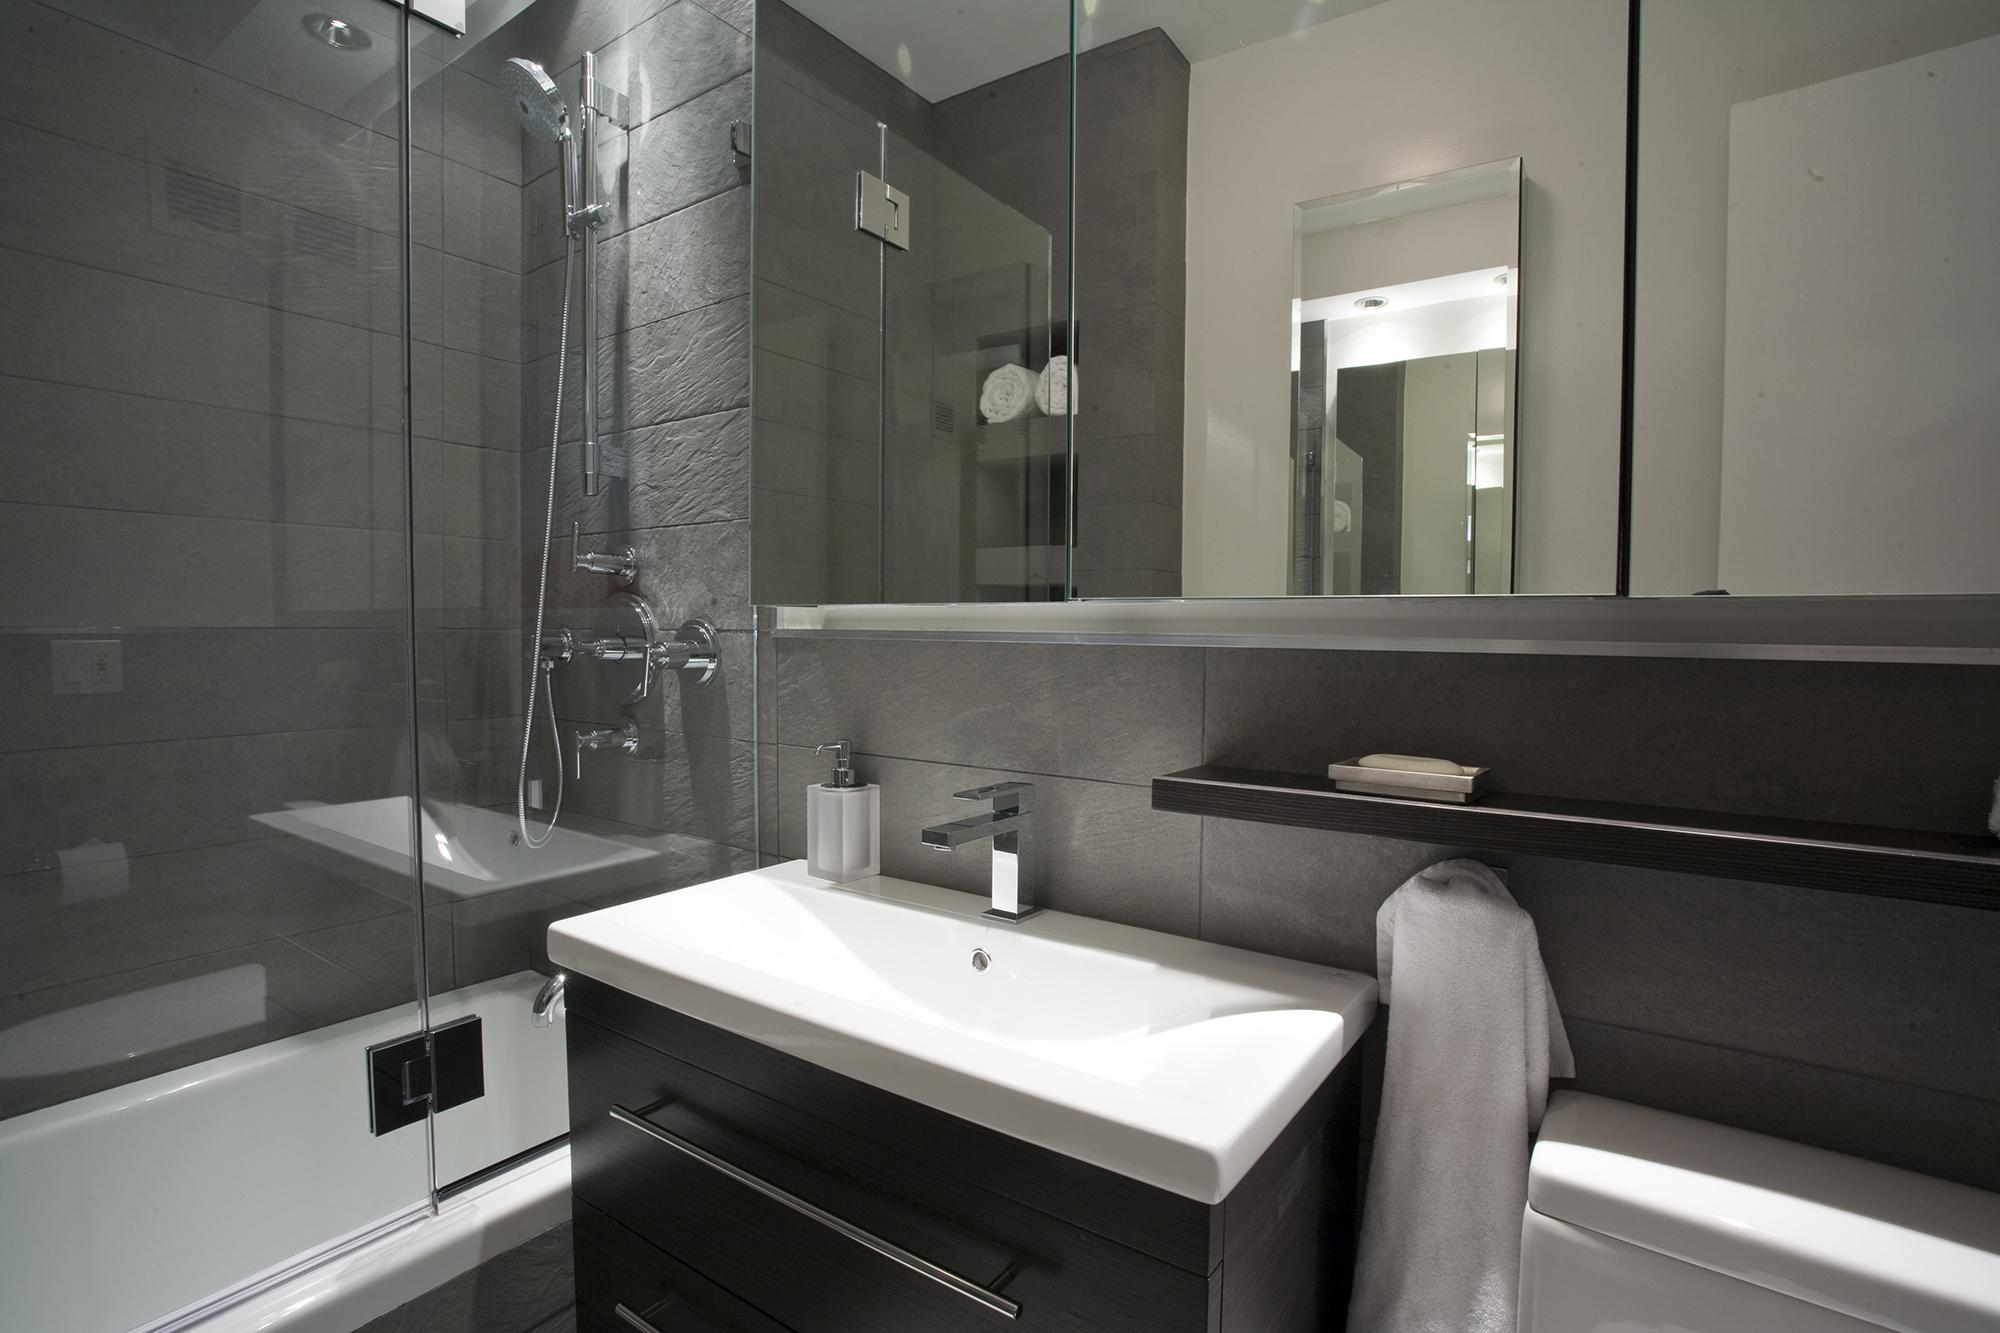 Стильная черно-белая ванная комната